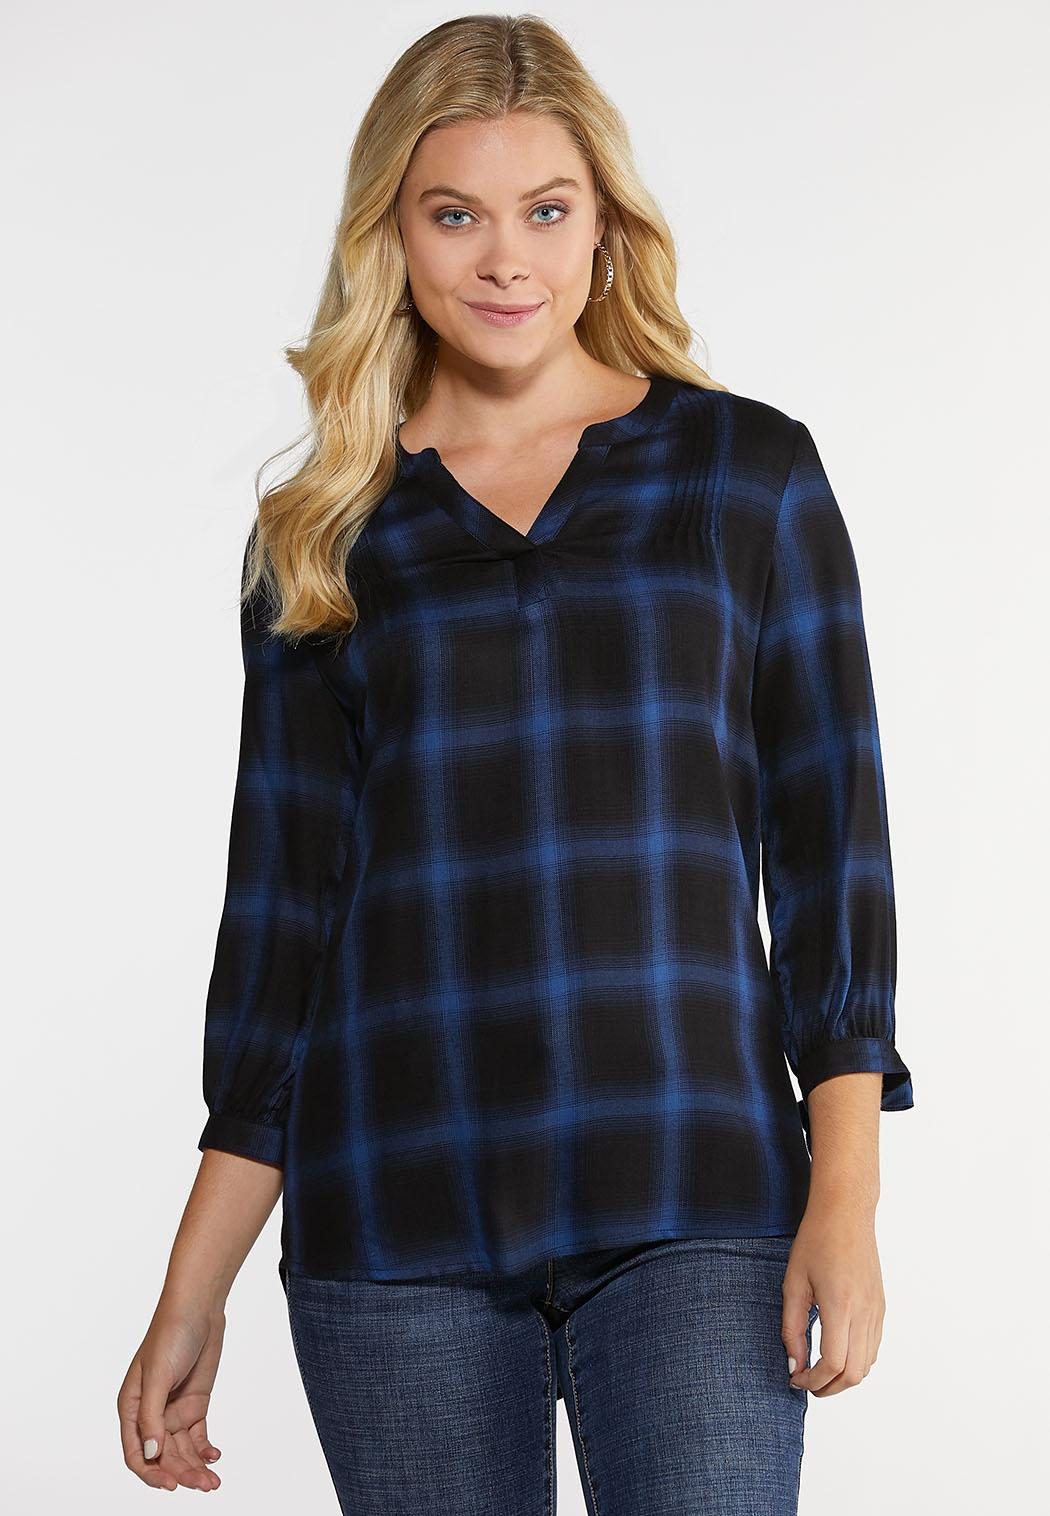 Plus Size Black And Blue Plaid Top